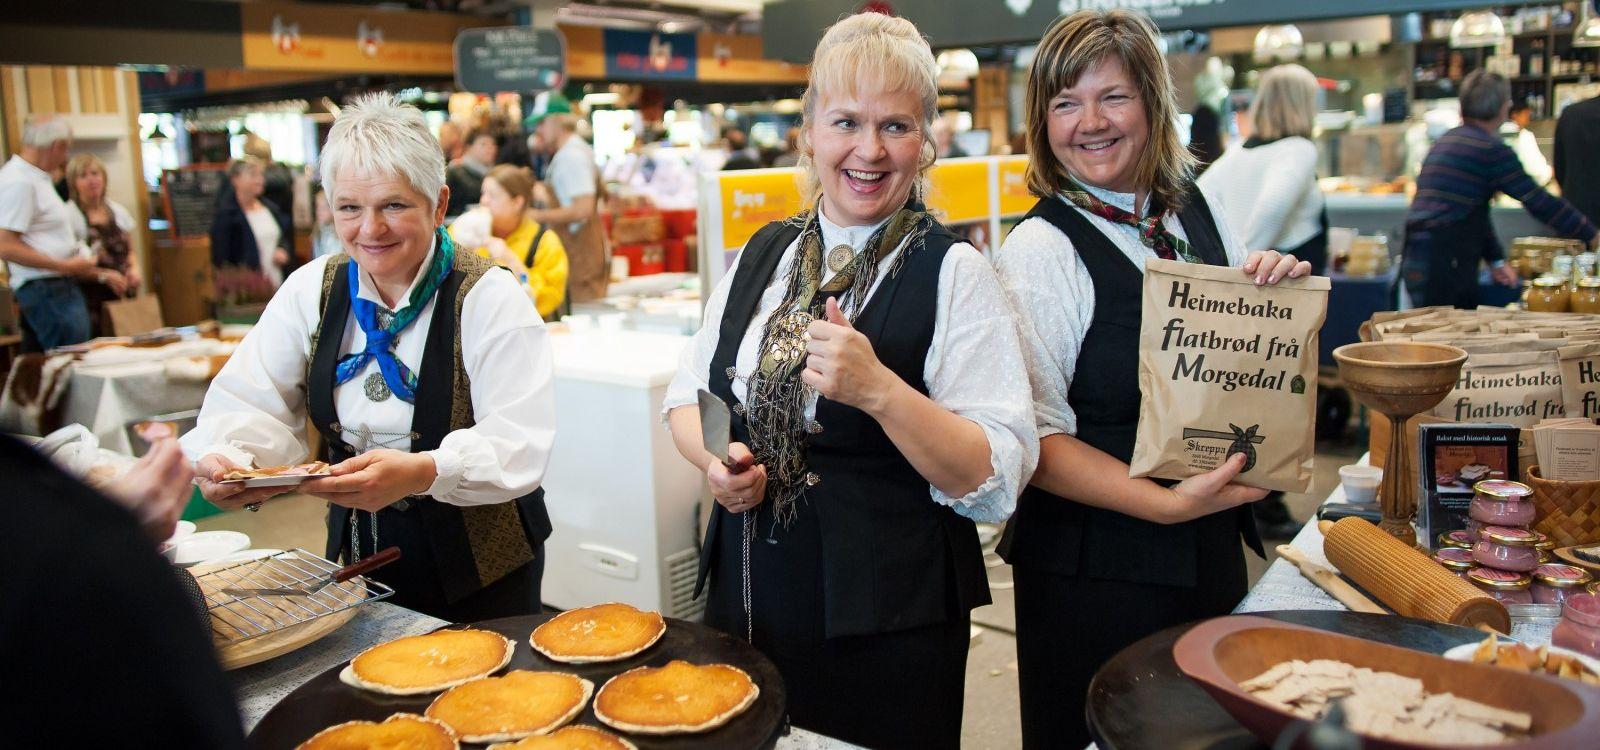 Рынок Матхаллен, Норвегия - как добраться